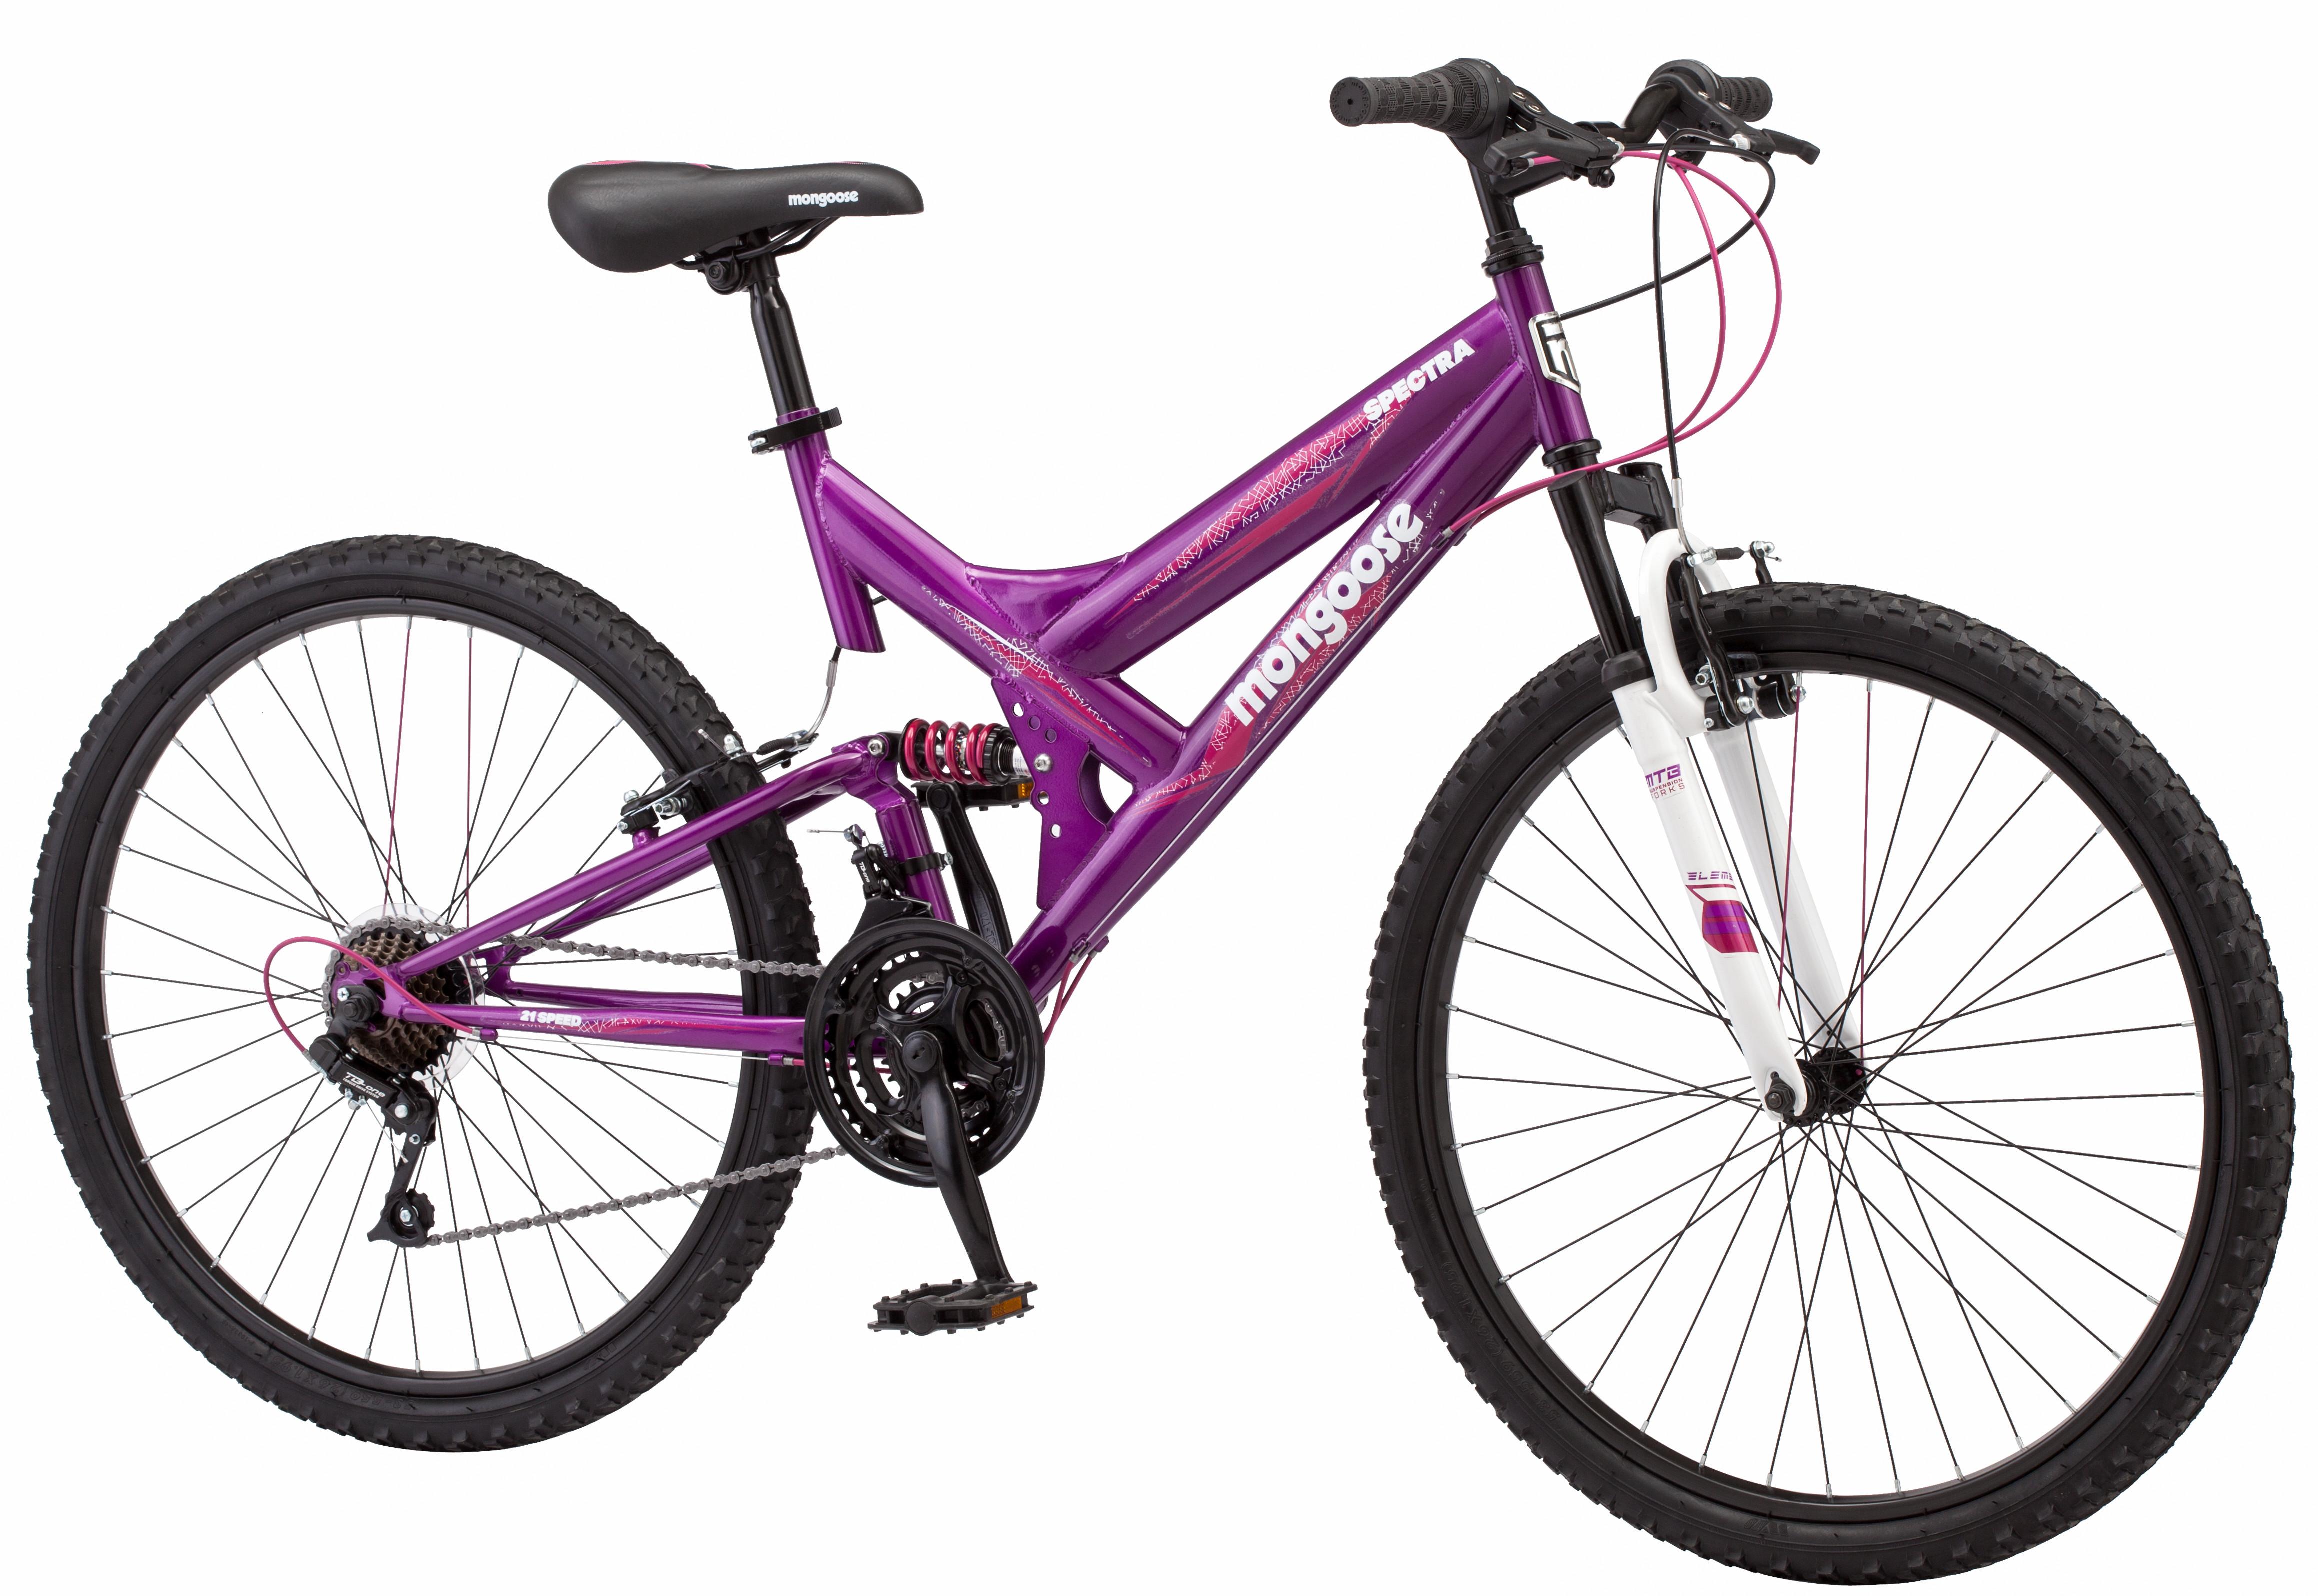 """""""Mongoose 26"""""""" Spectra Women's Mountain Bike, Size: Large, Purple"""""" im test"